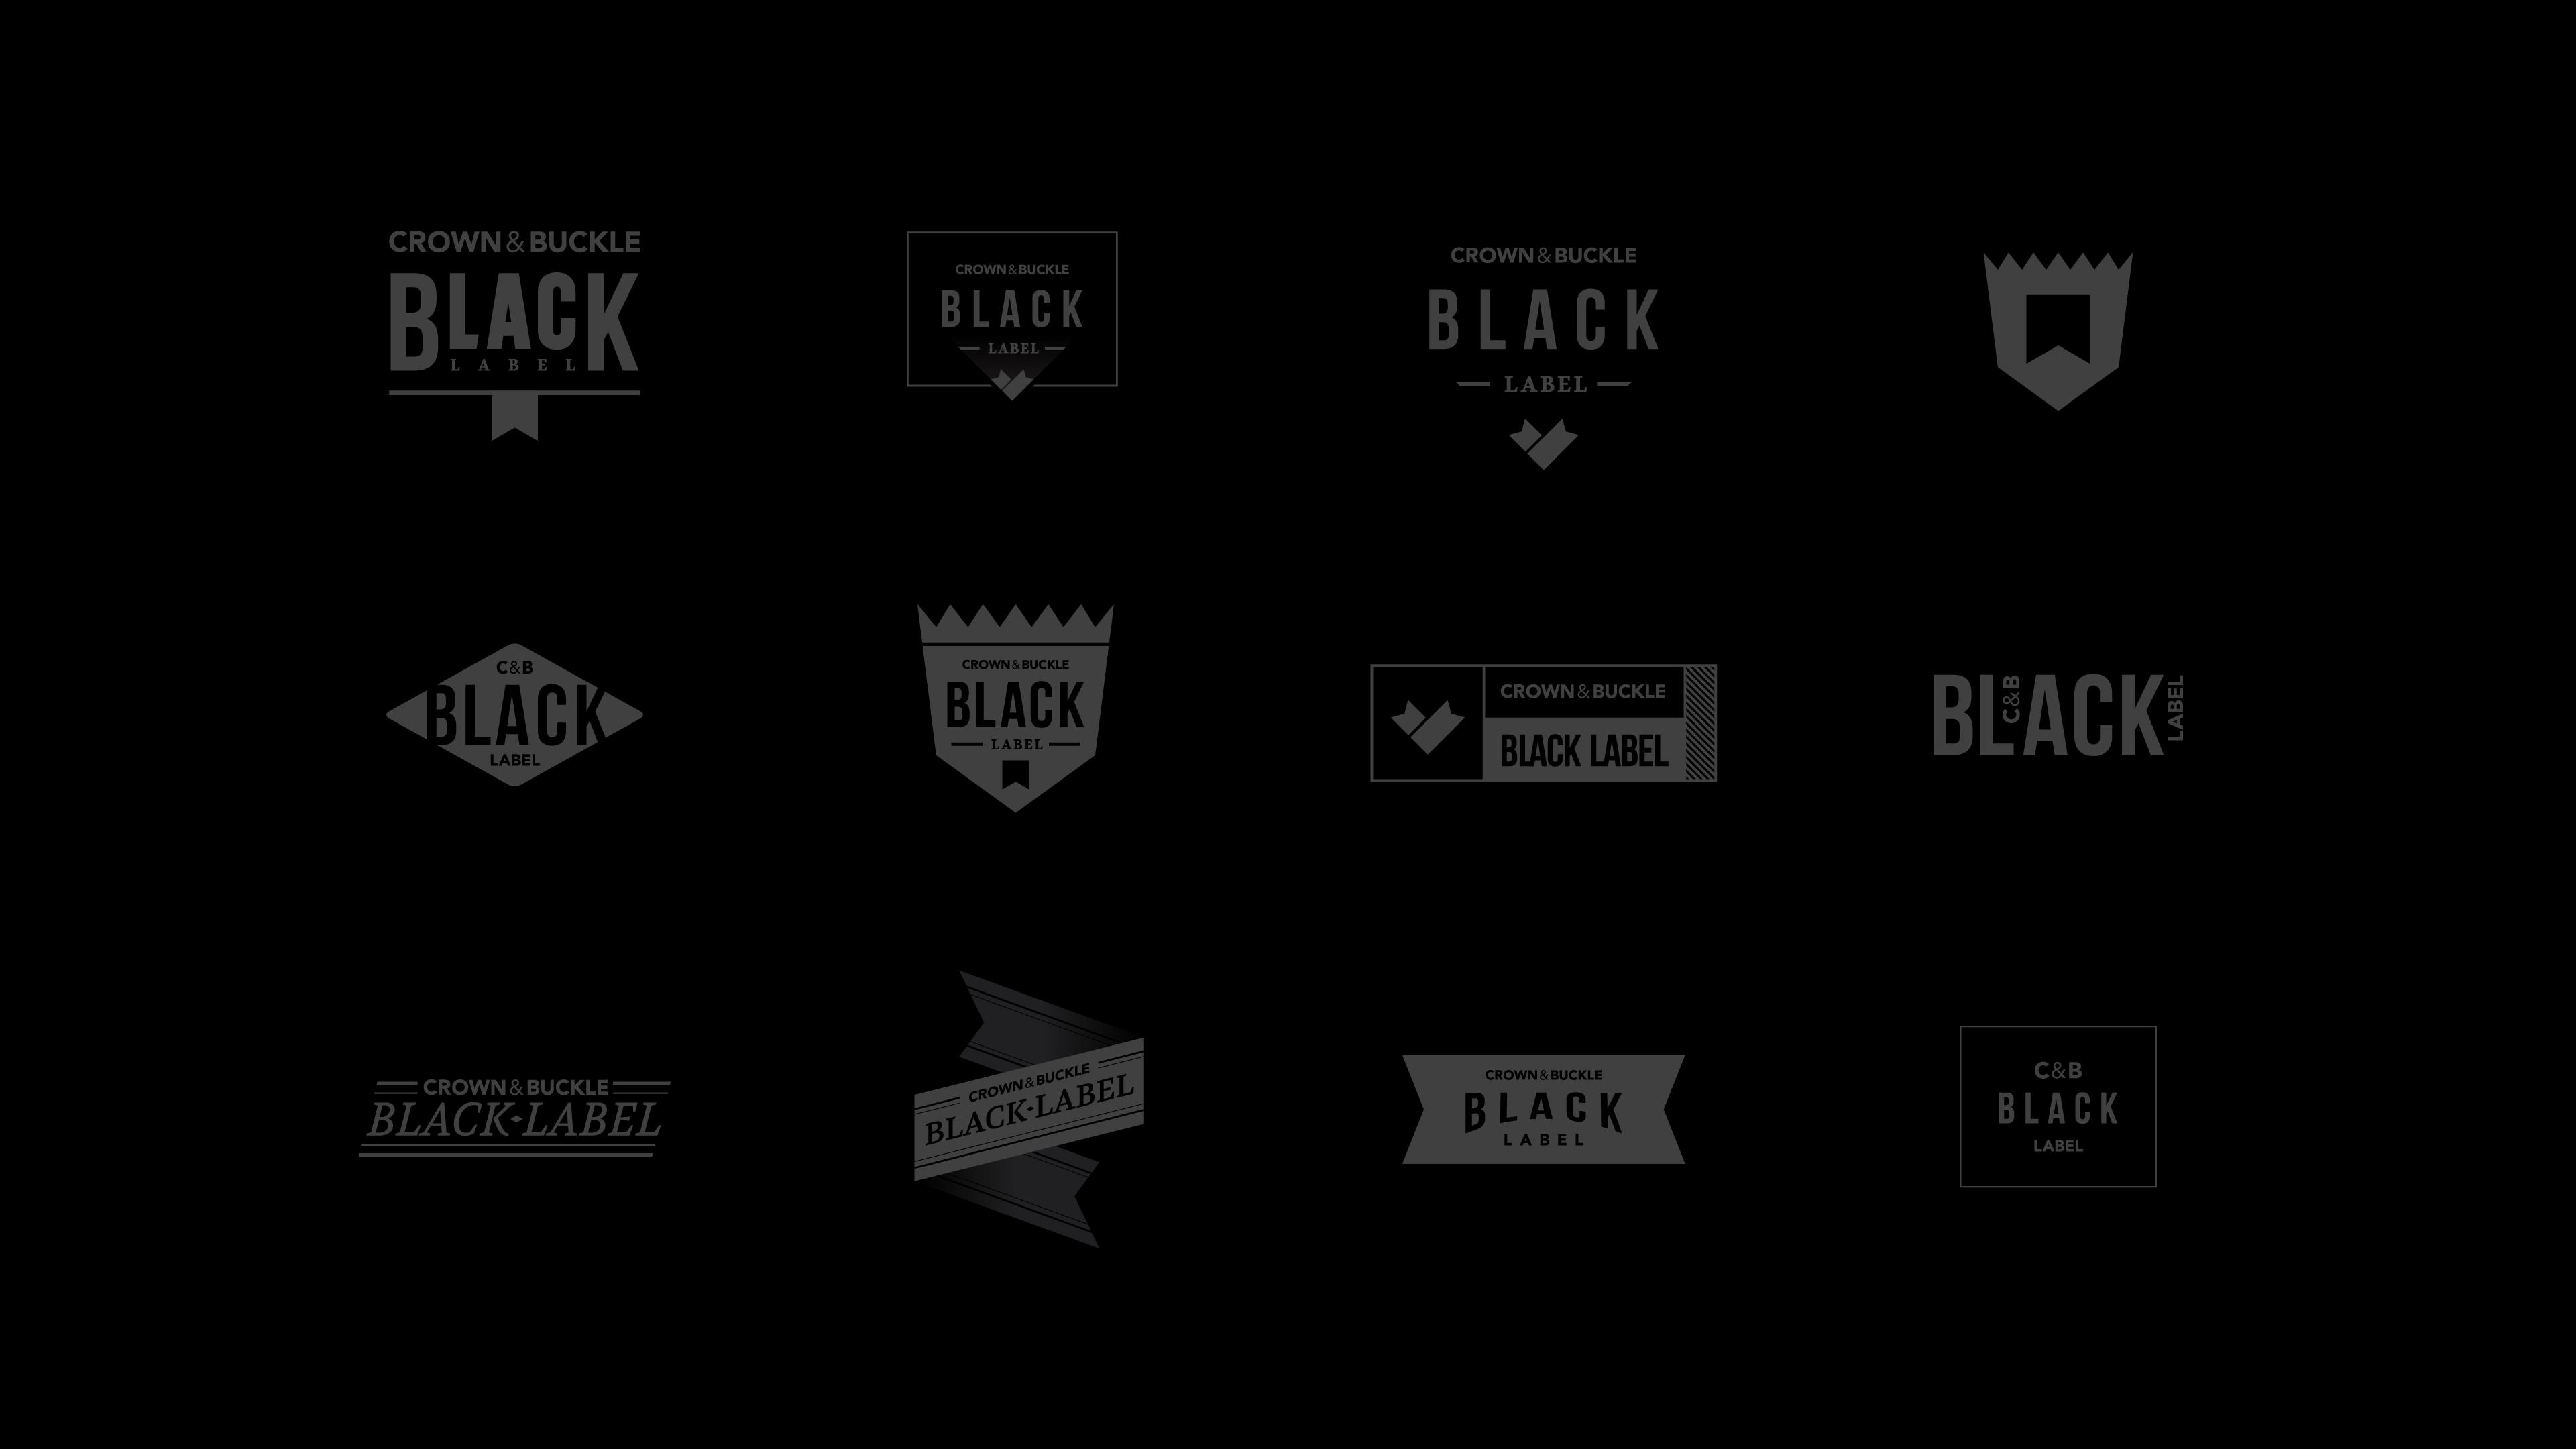 Black Label Crown & Buckle Website by Motto